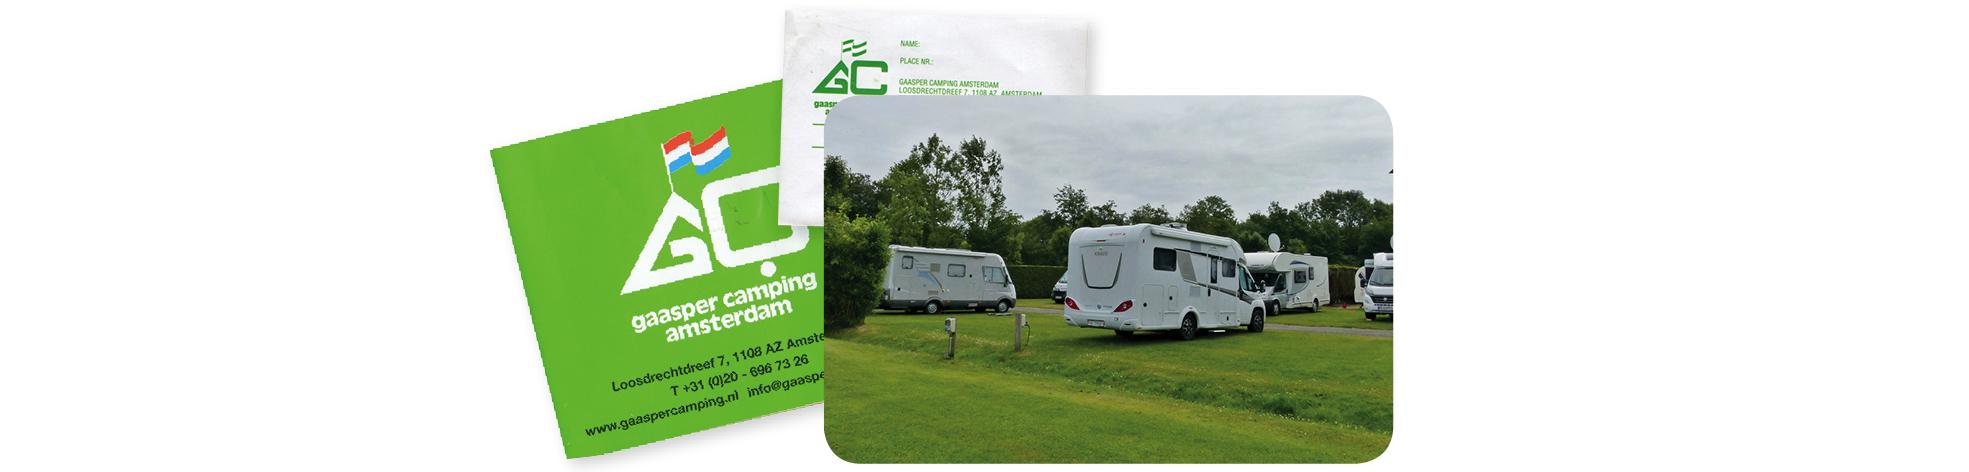 Amsterdam, camping, gaasper, logement, voyage, road trip, Europe, capitale, hollande